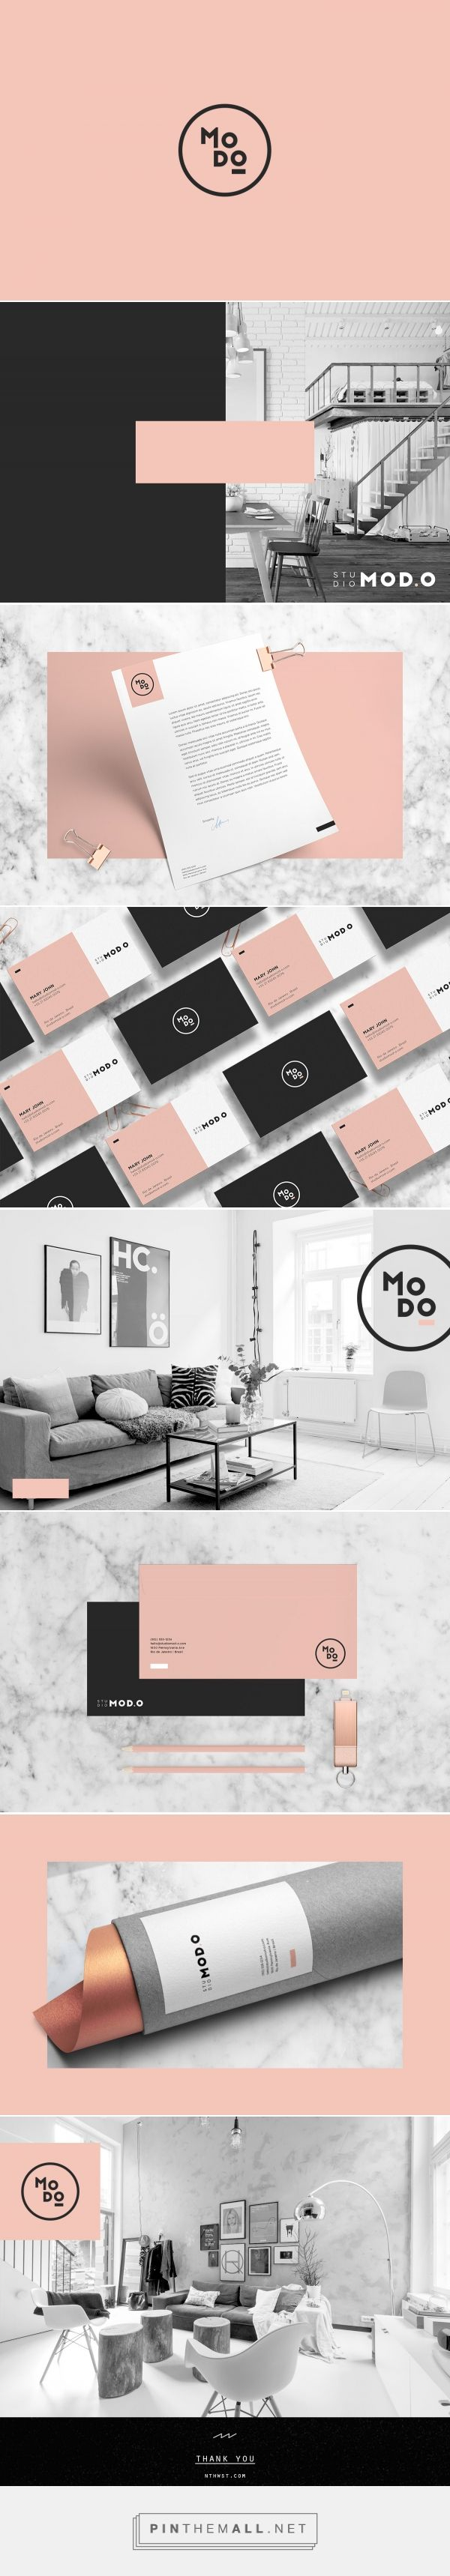 Mod.o Architect Studio Branding by Bia Milhomem | Fivestar Branding Agency – Design and Branding Agency & Curated Inspiration Gallery